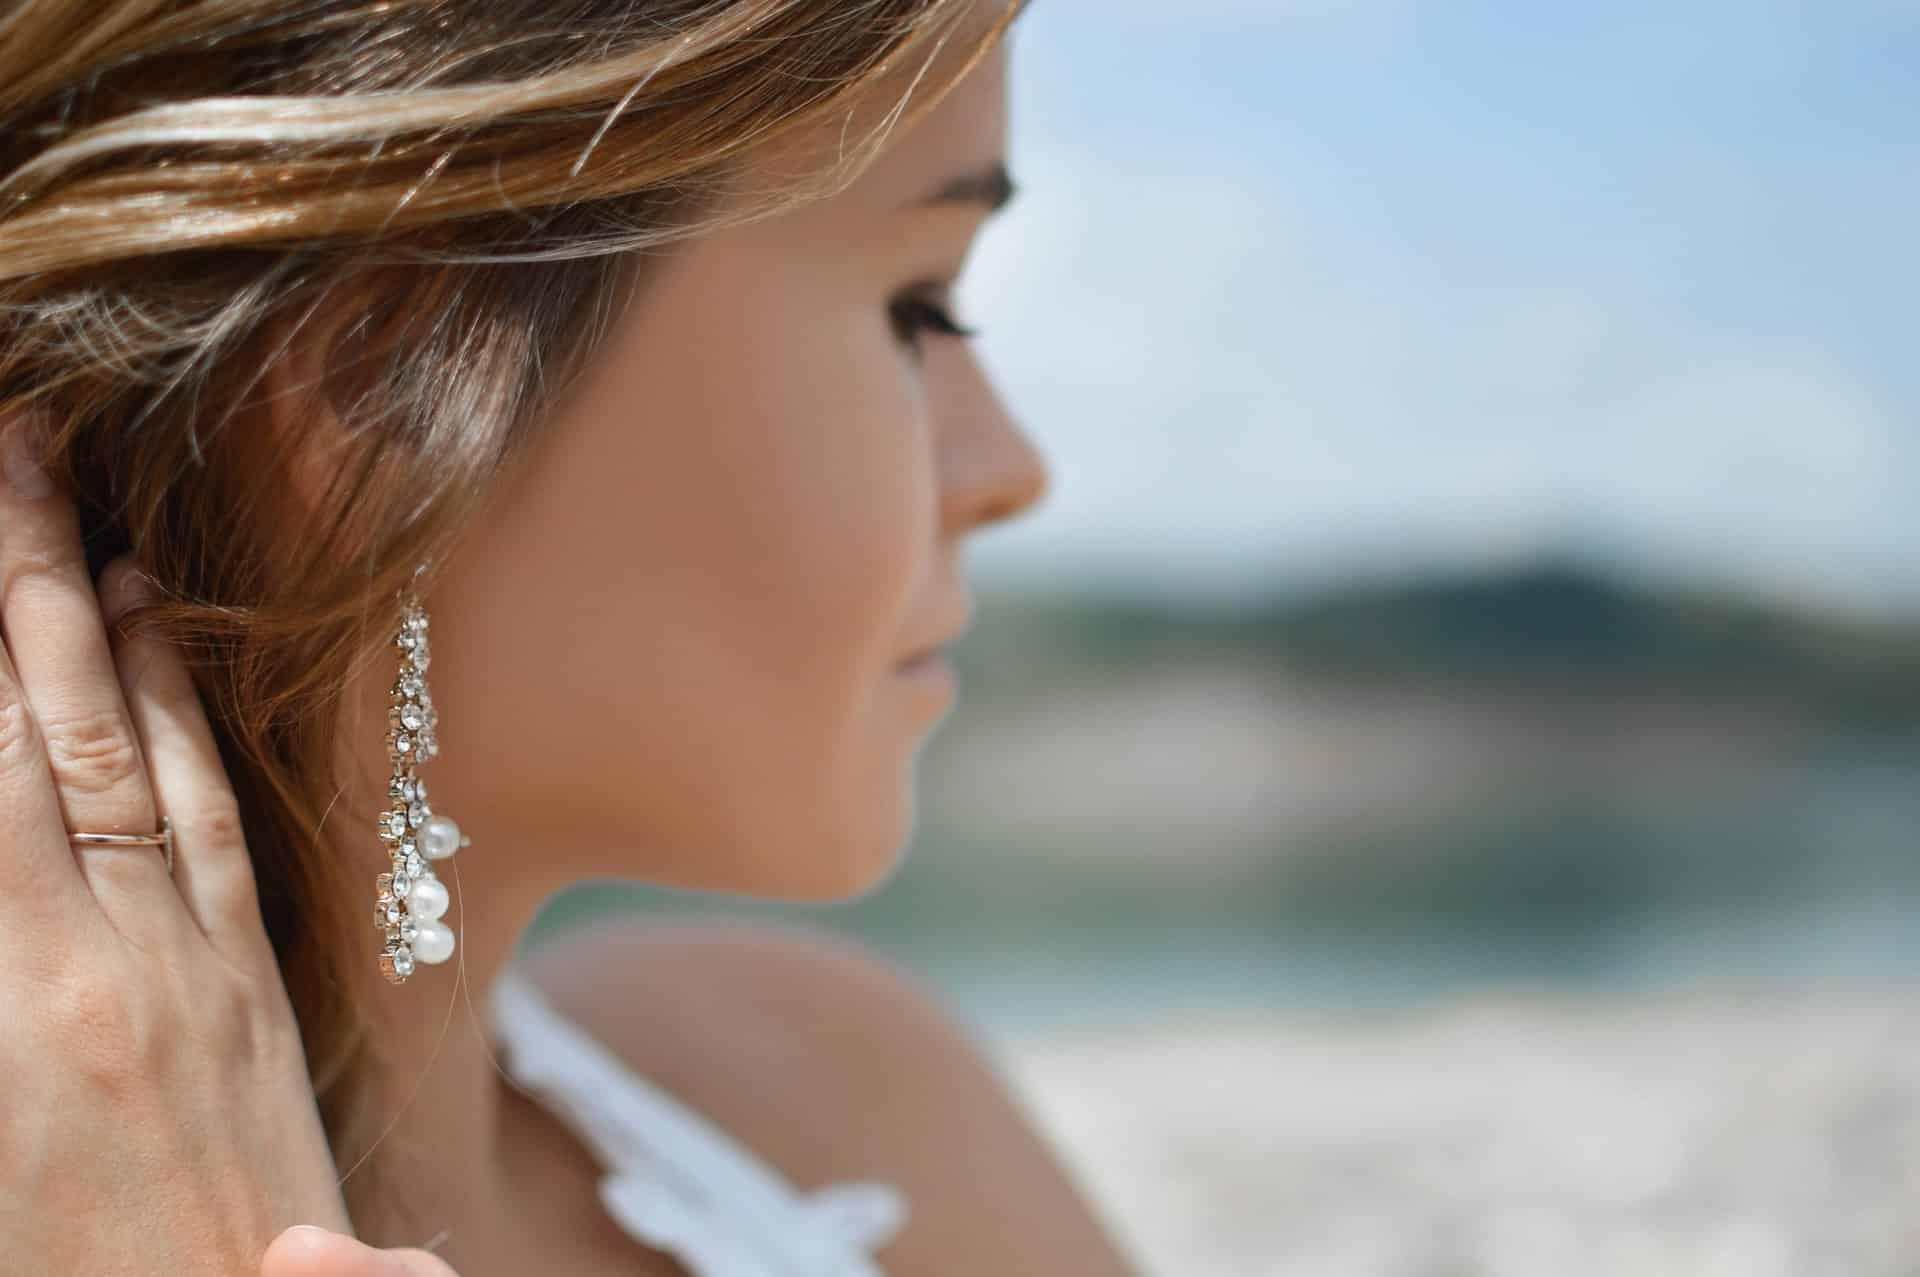 How Choose Earrings Face Header Image